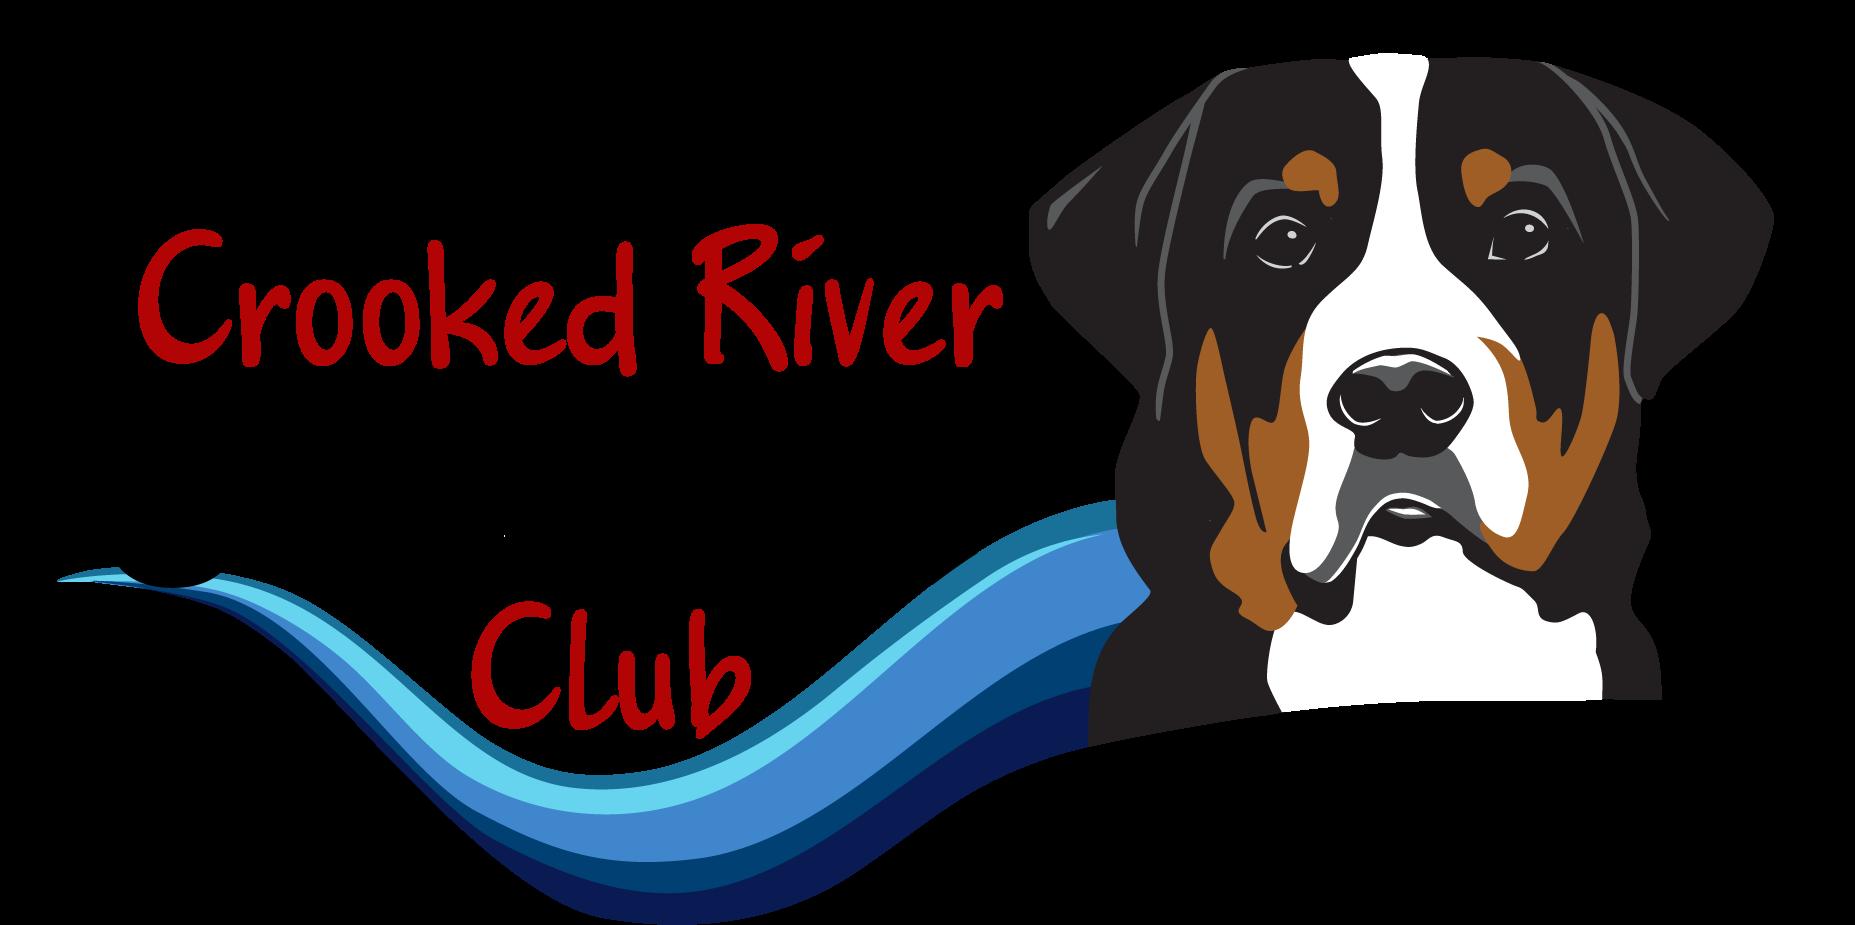 CROOKED RIVER SWISSY CLUB